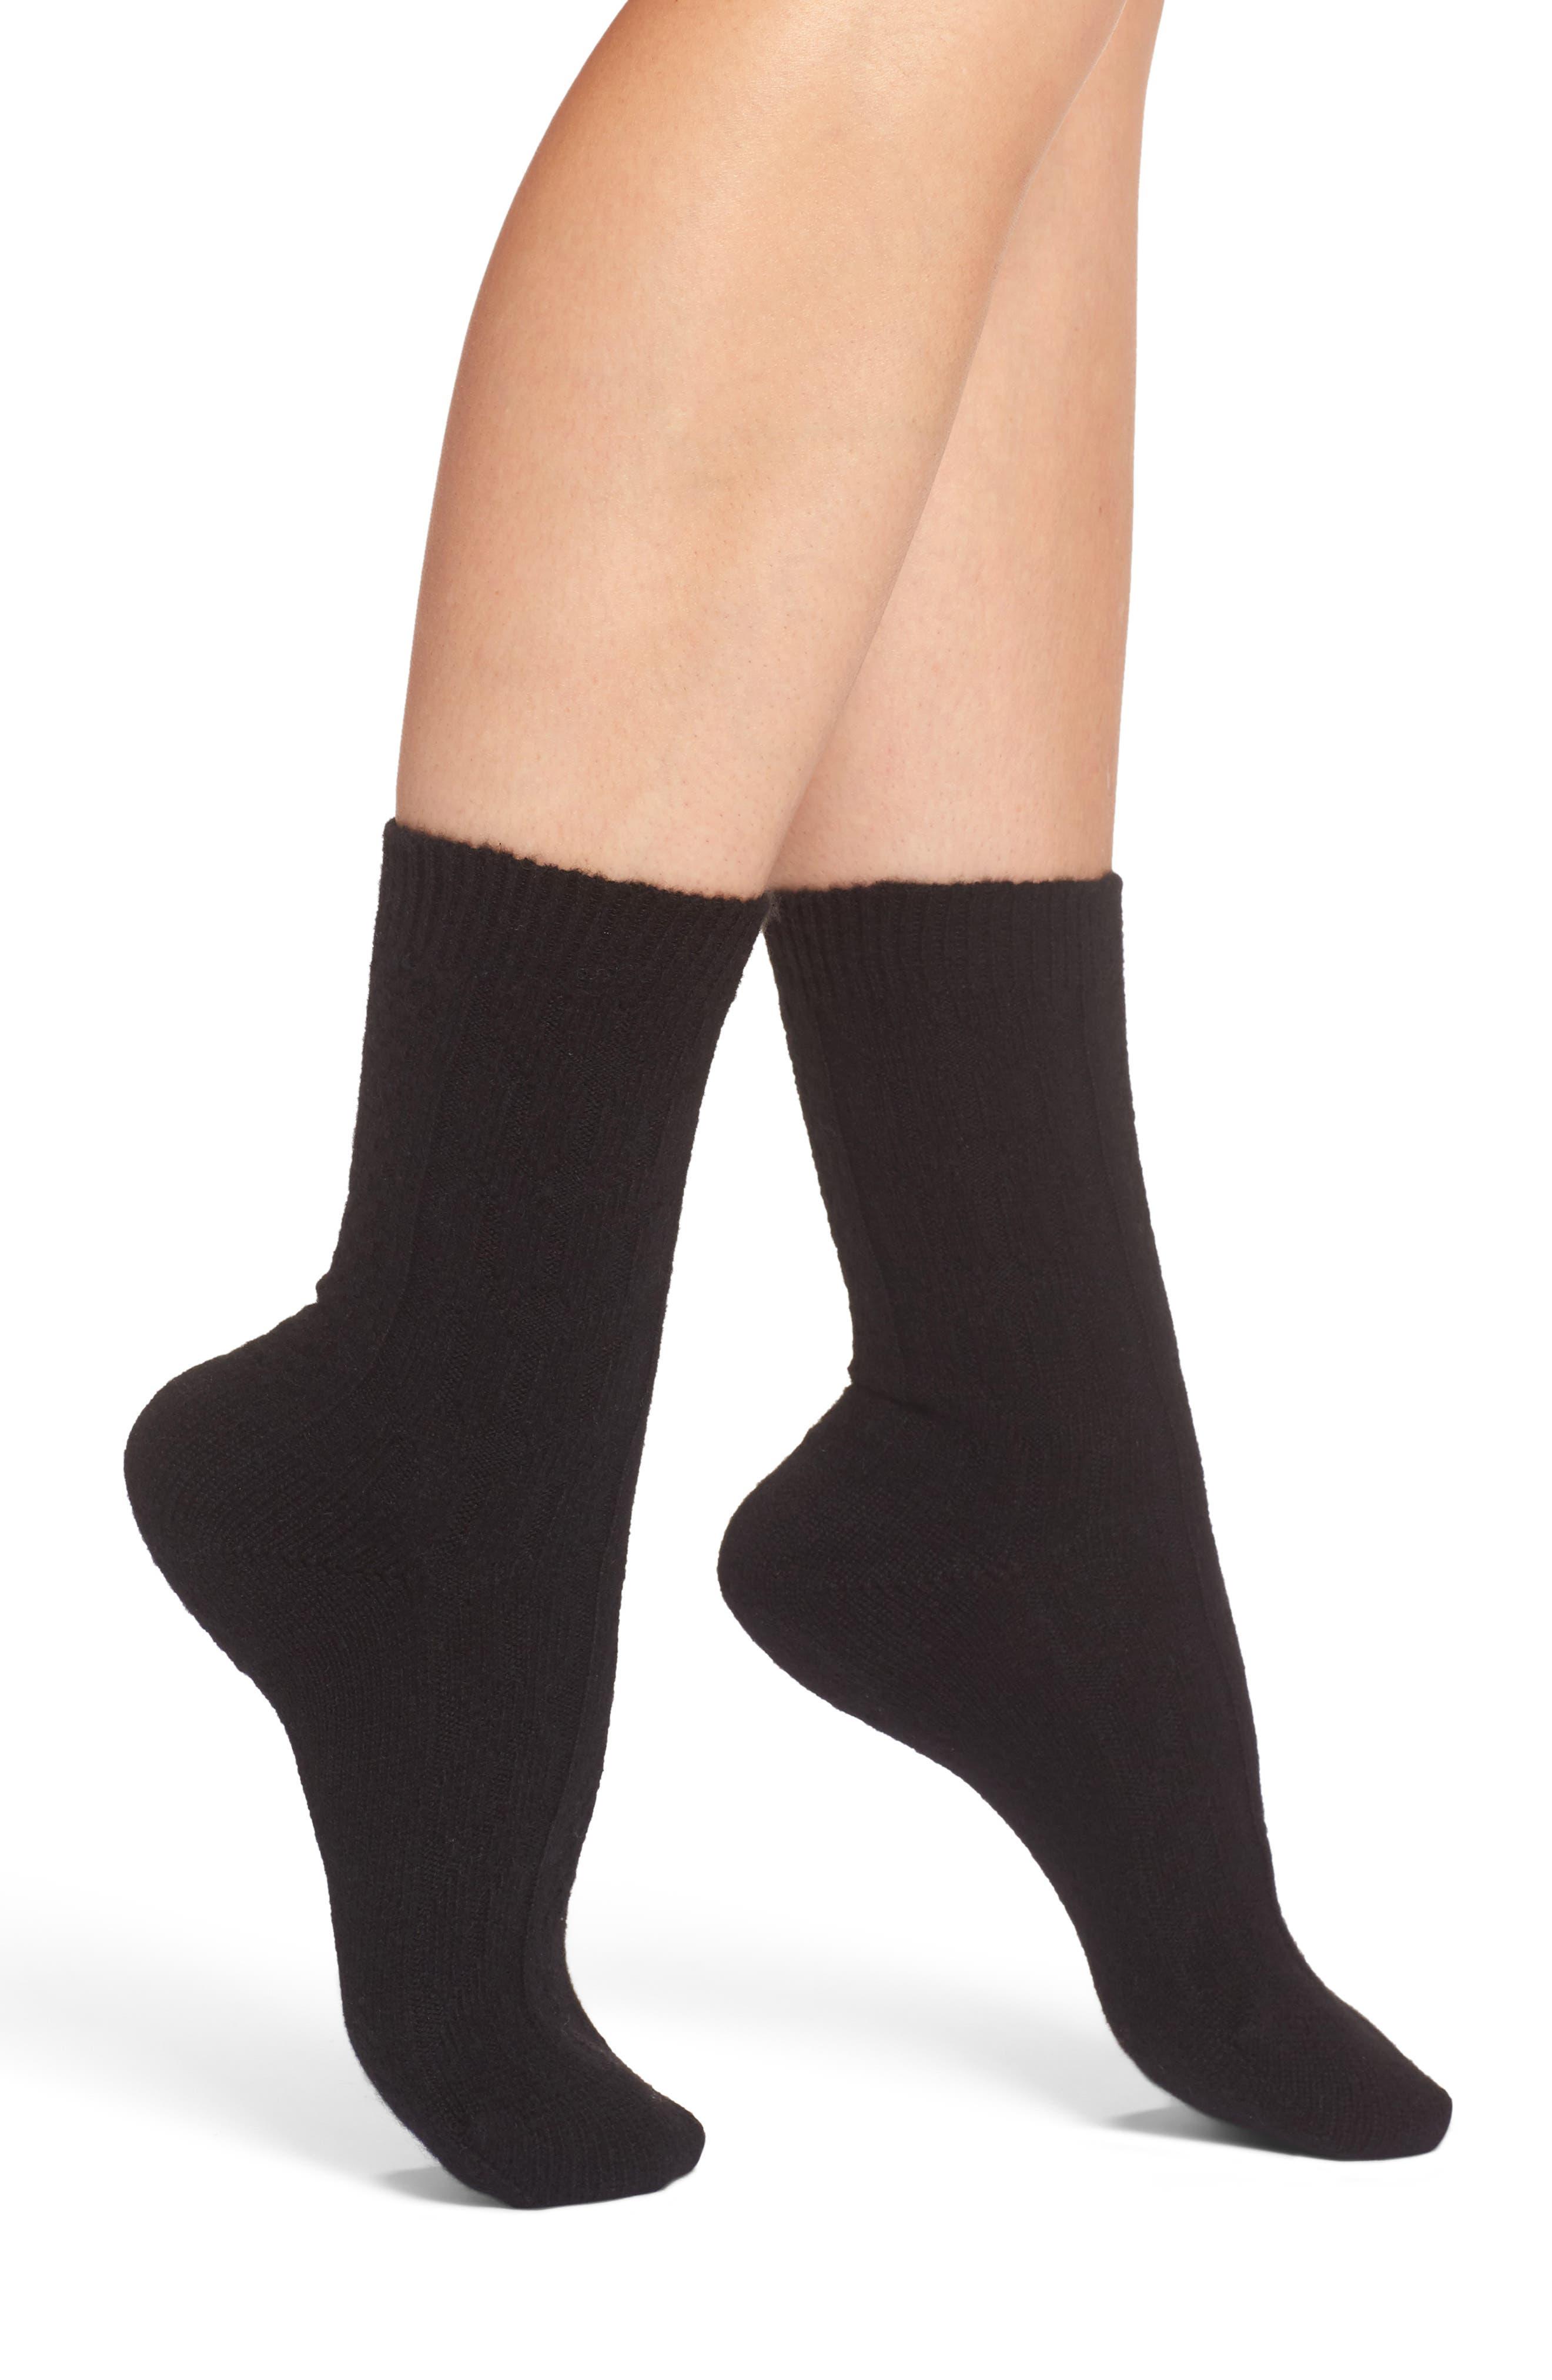 Pantherella Christina Crew Socks